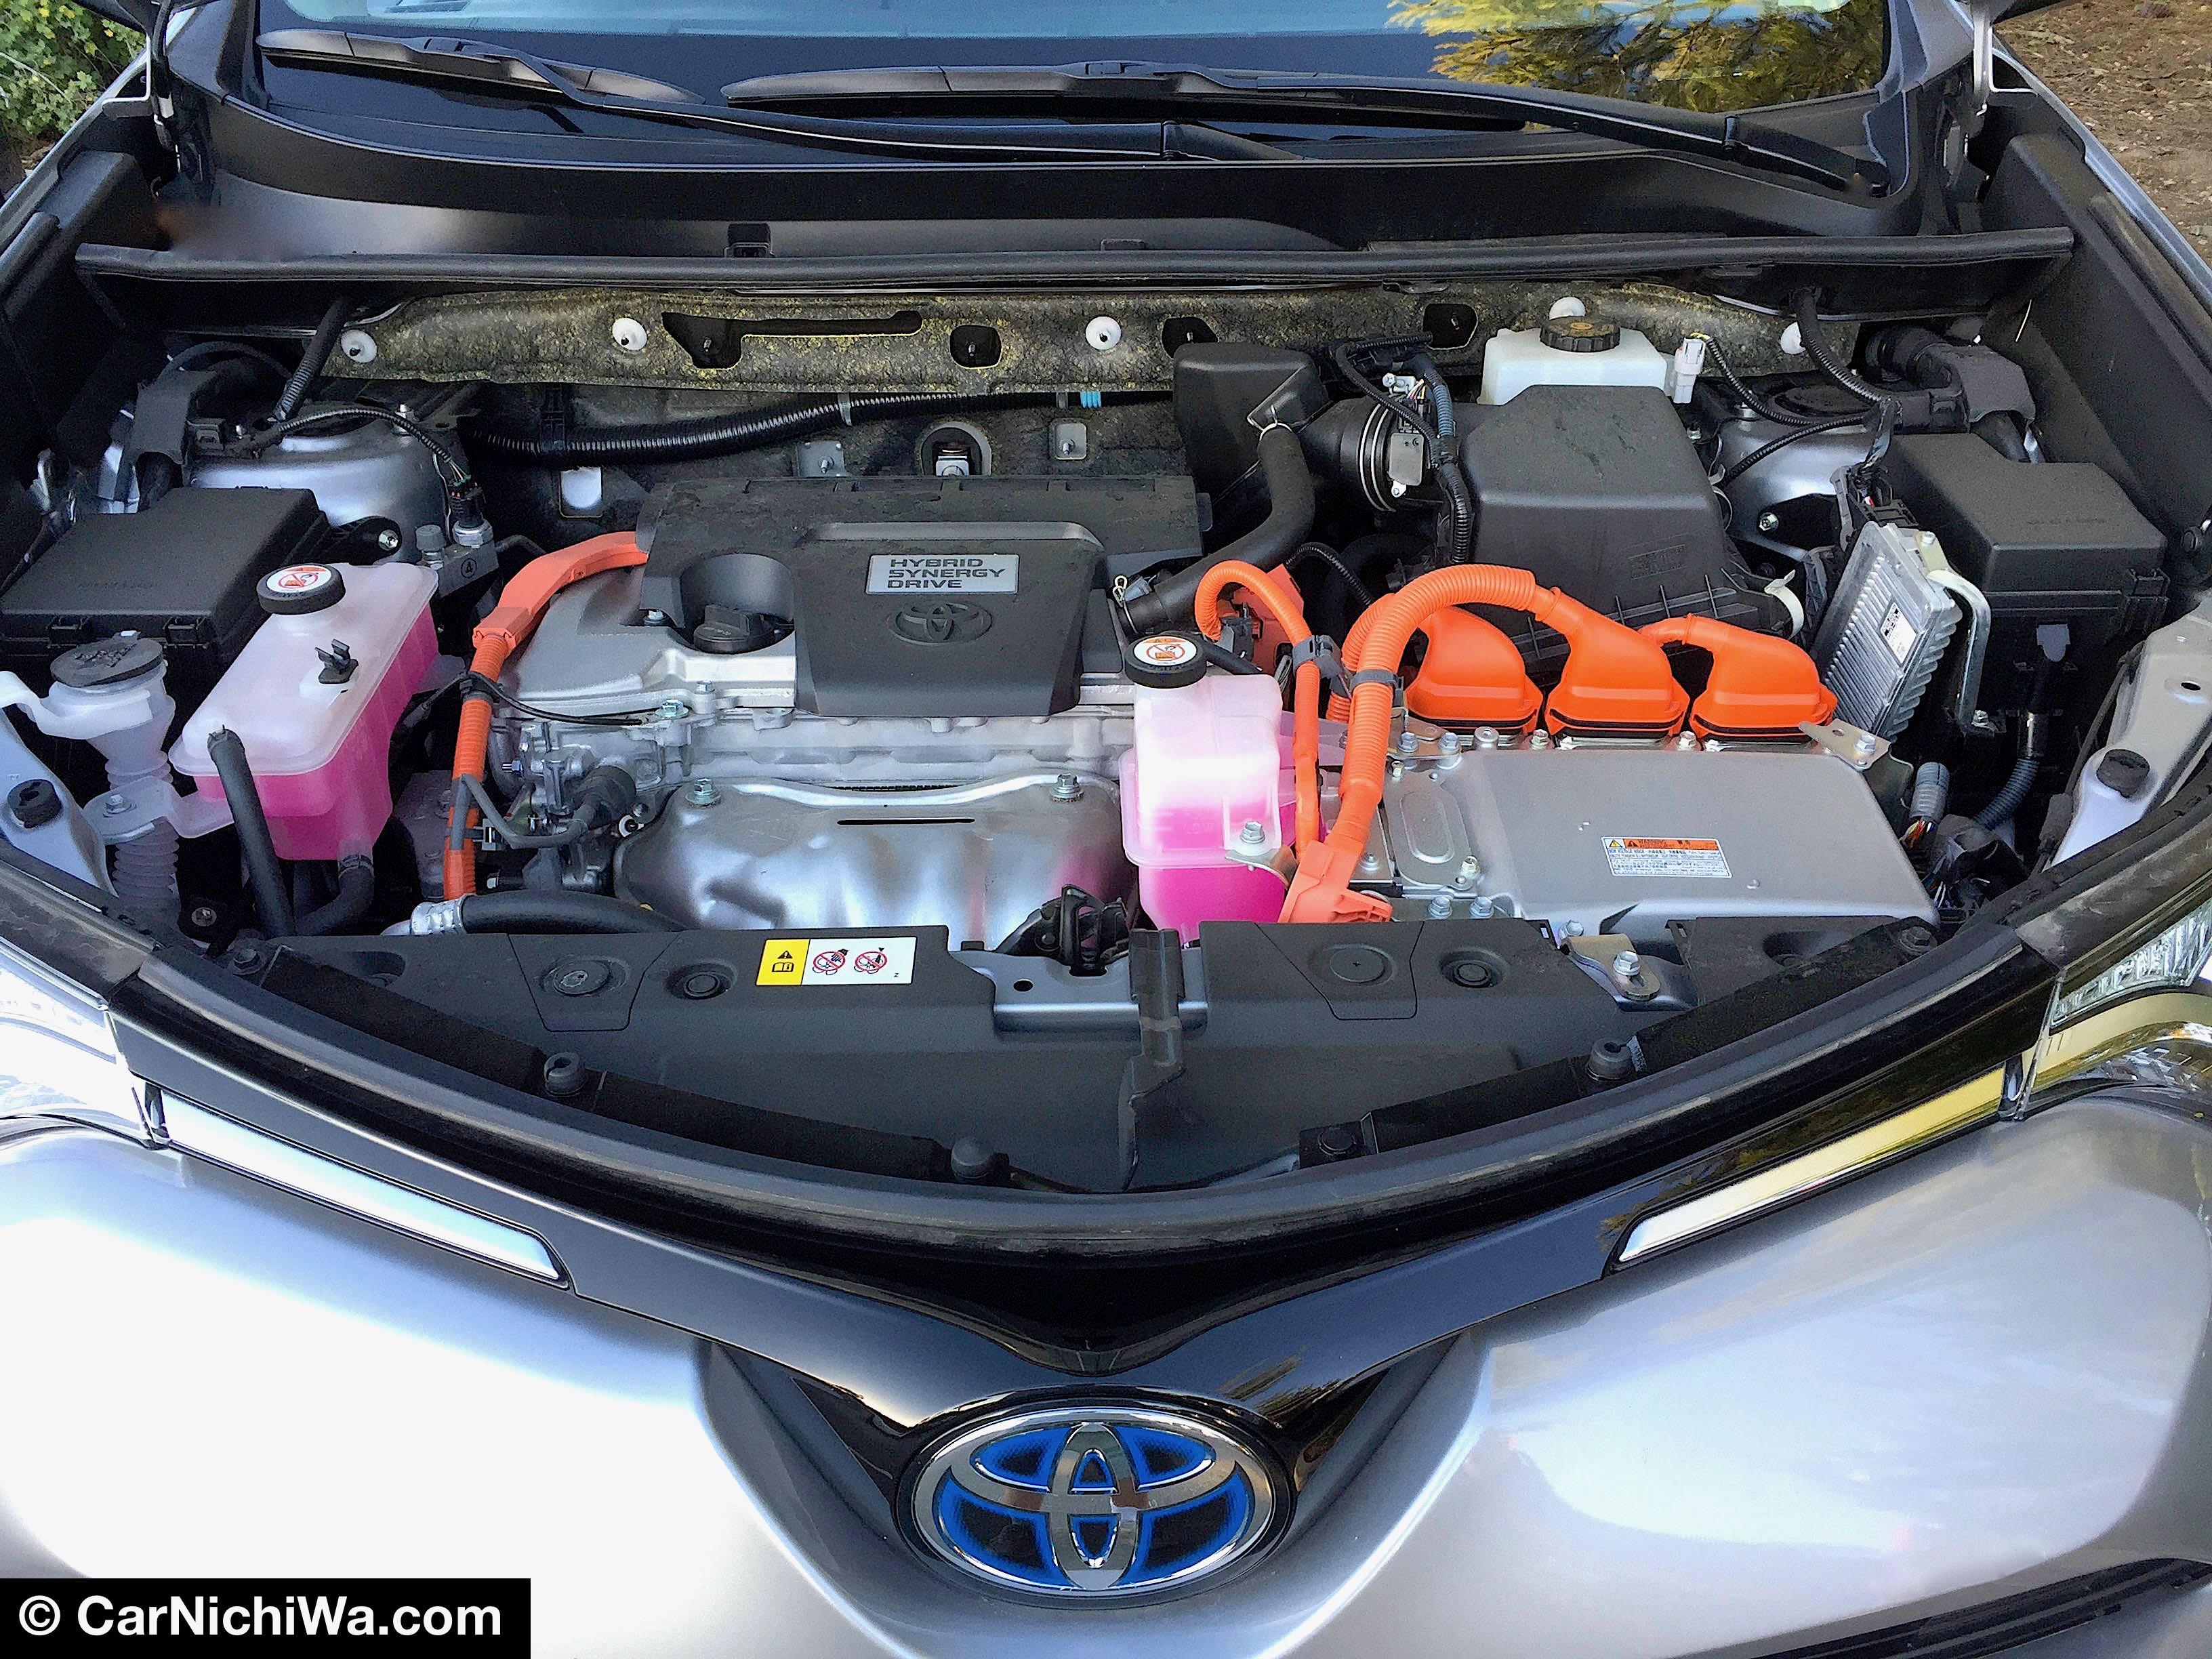 2017 Toyota RAV4 Hybrid Review – Top-Selling Toyota Offers Hybrid